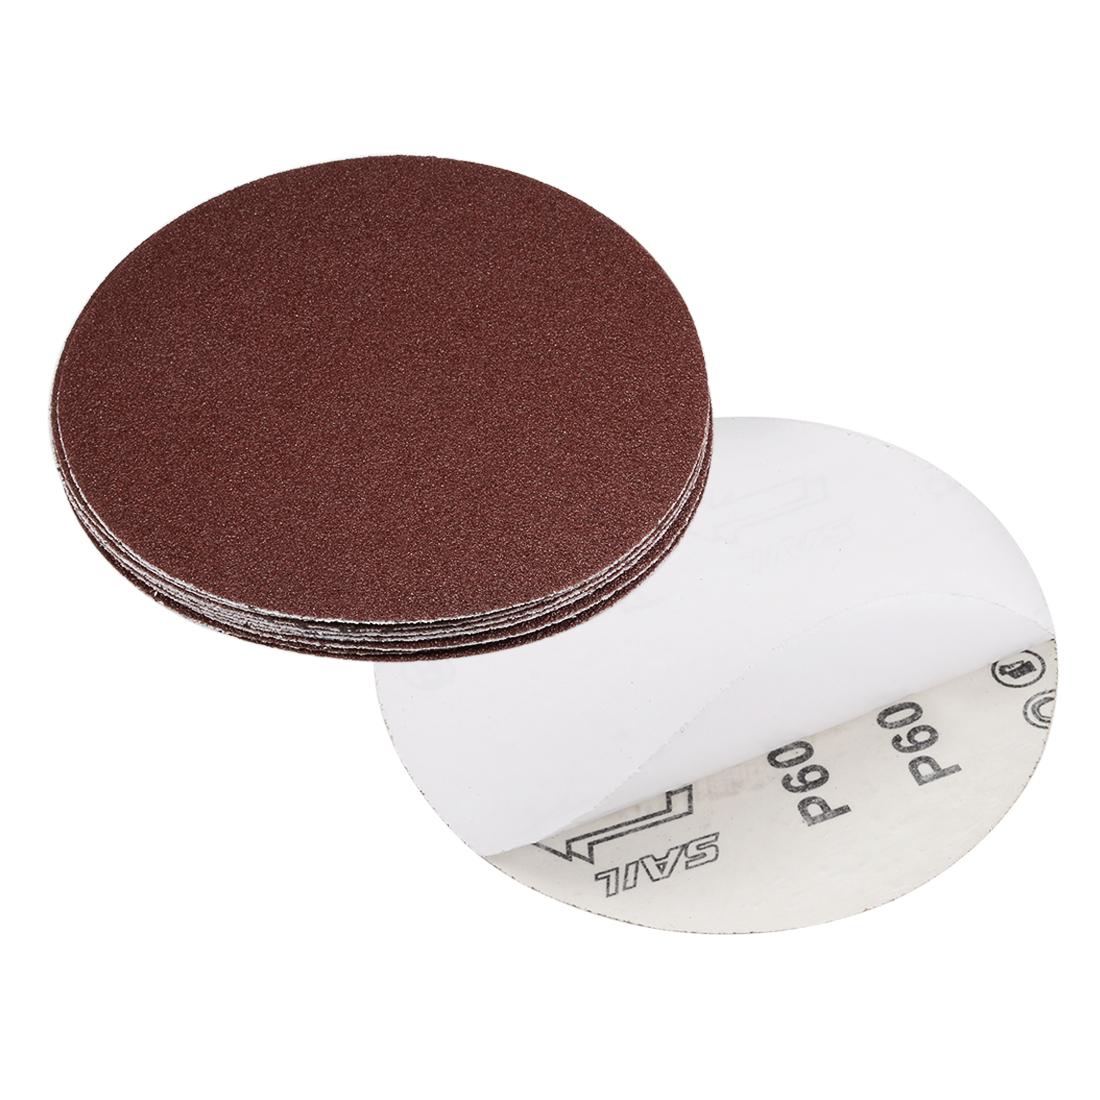 6-inch 60-Grits PSA Sanding Disc, Adhesive-Backed for Orbital Sander 10pcs